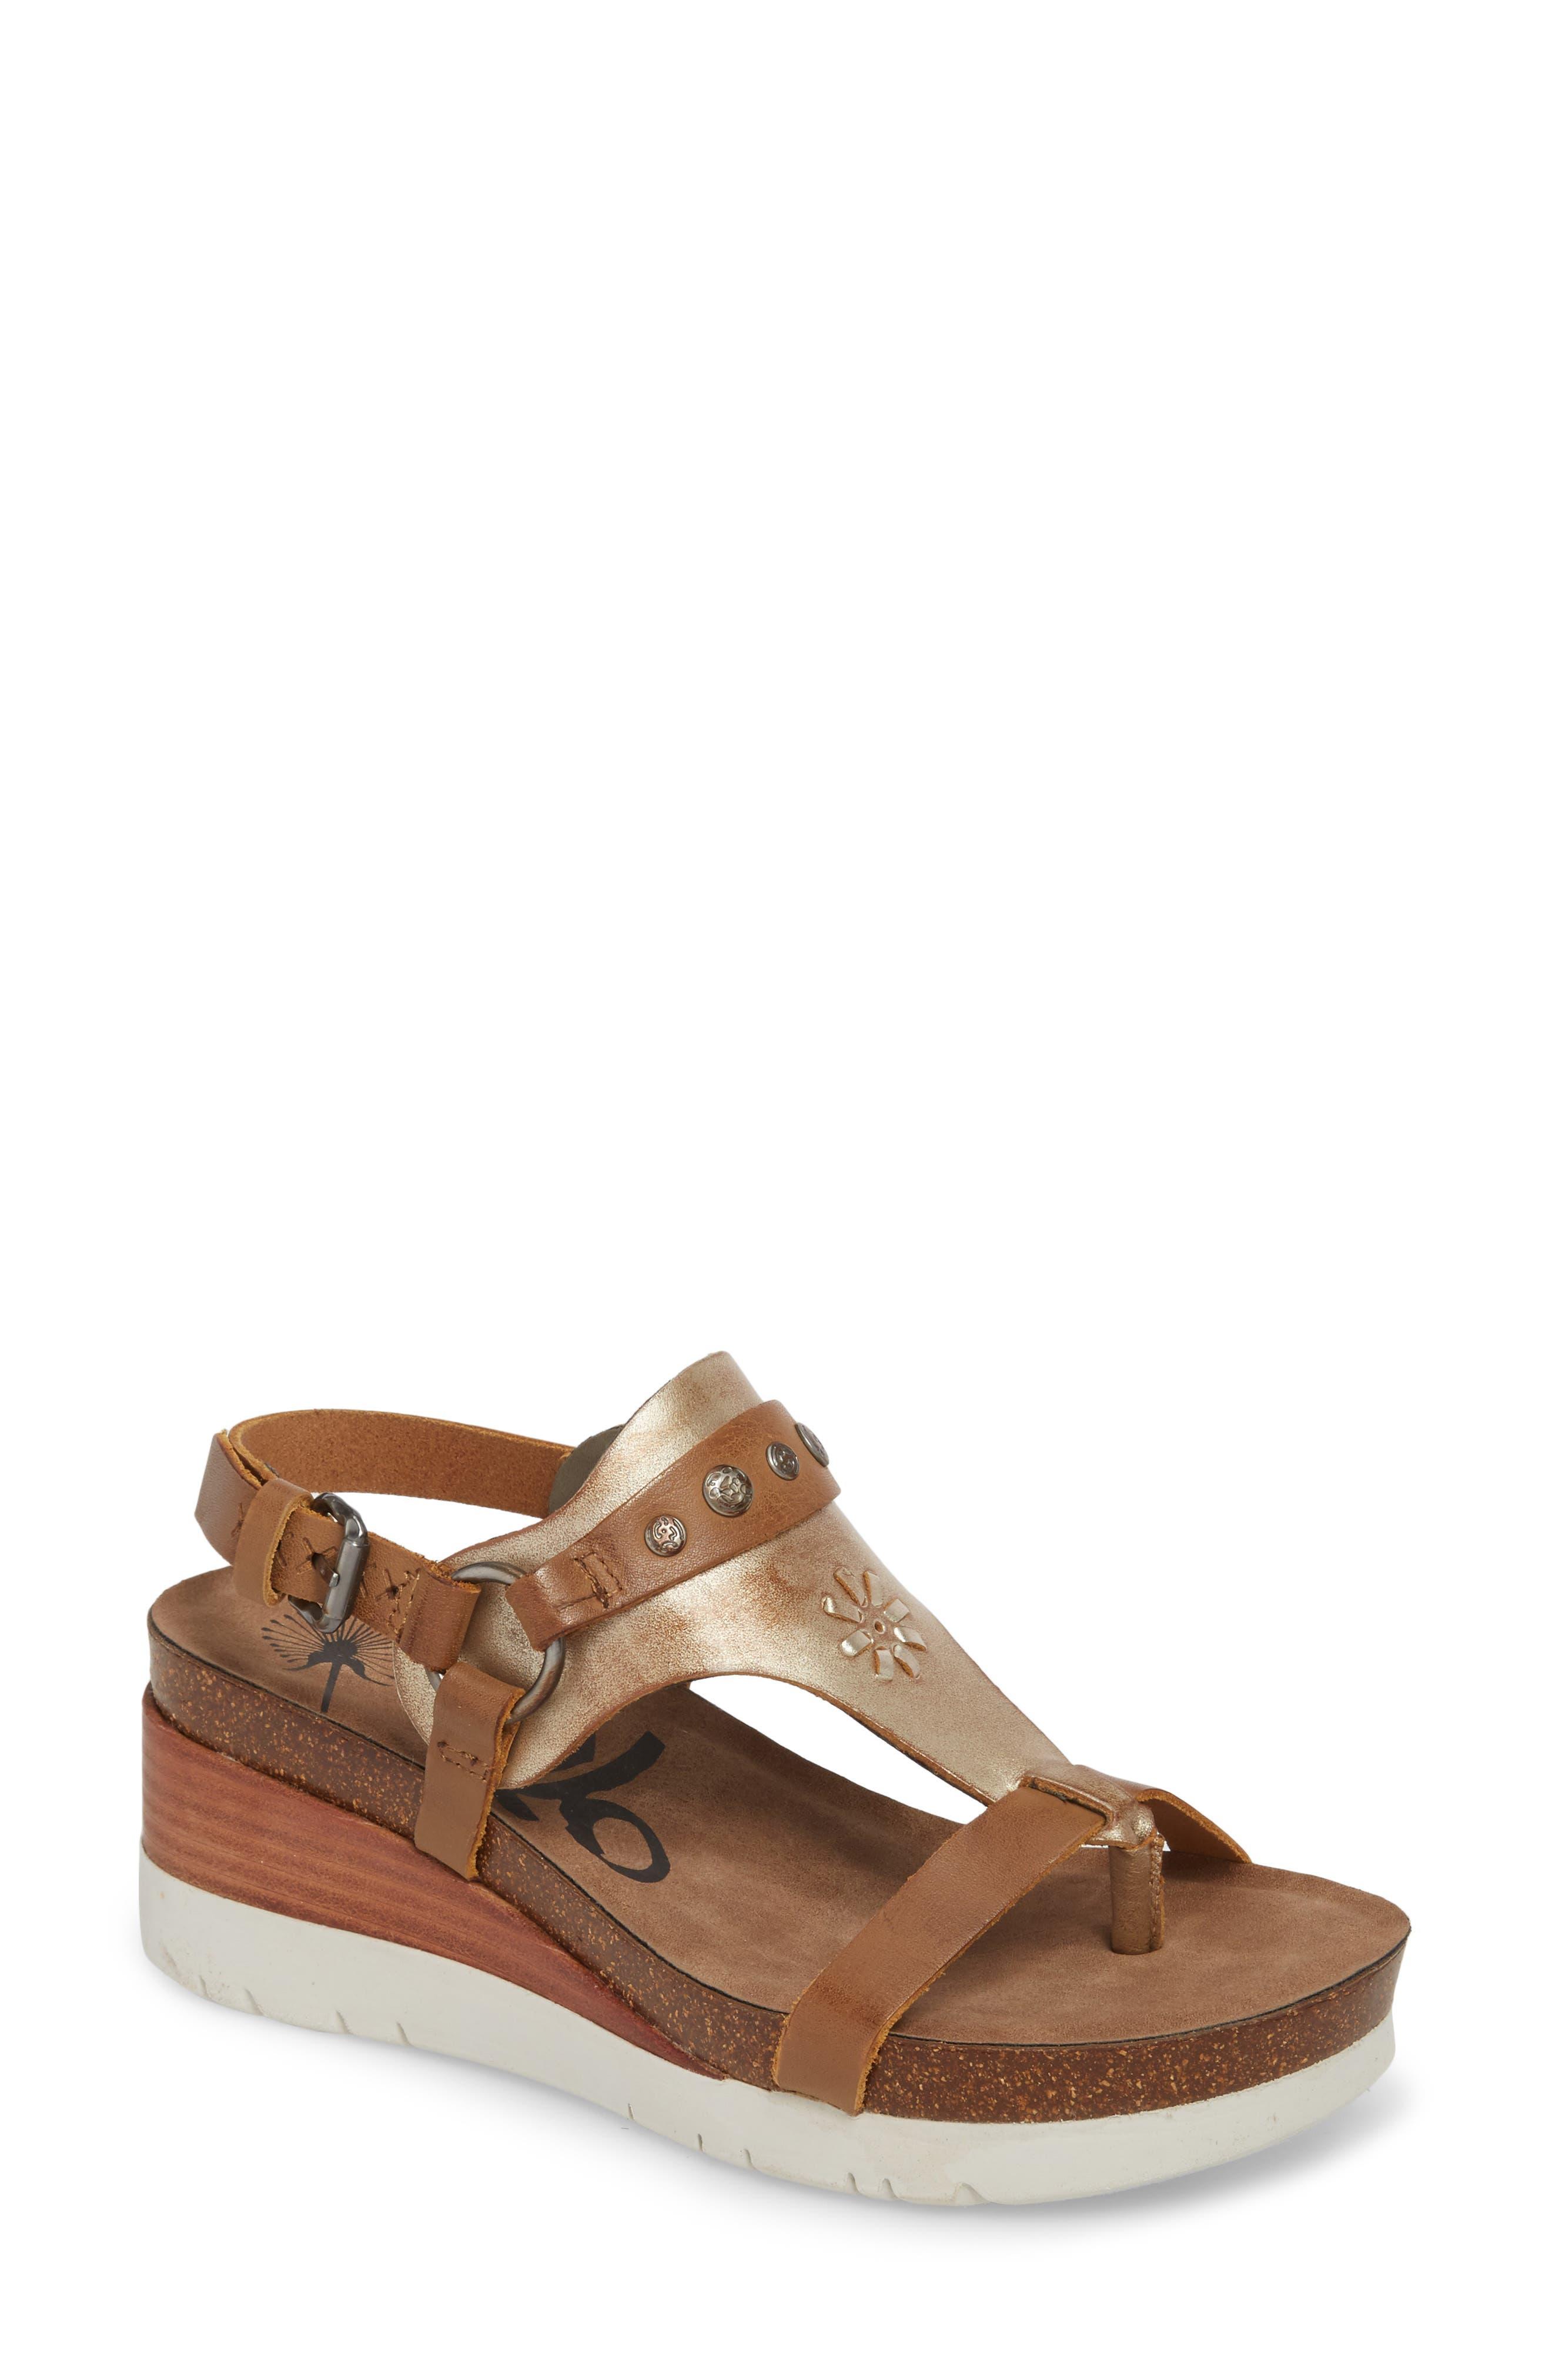 Maverick Wedge Sandal,                             Main thumbnail 1, color,                             New Taupe Leather